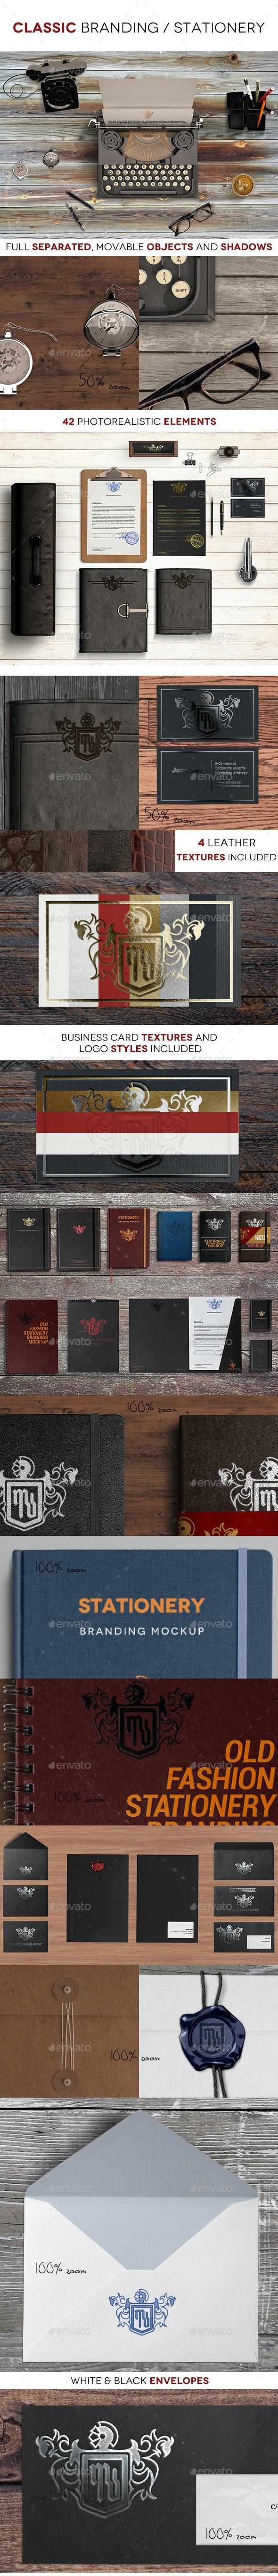 Classic Branding / Stationery - Stationery Print